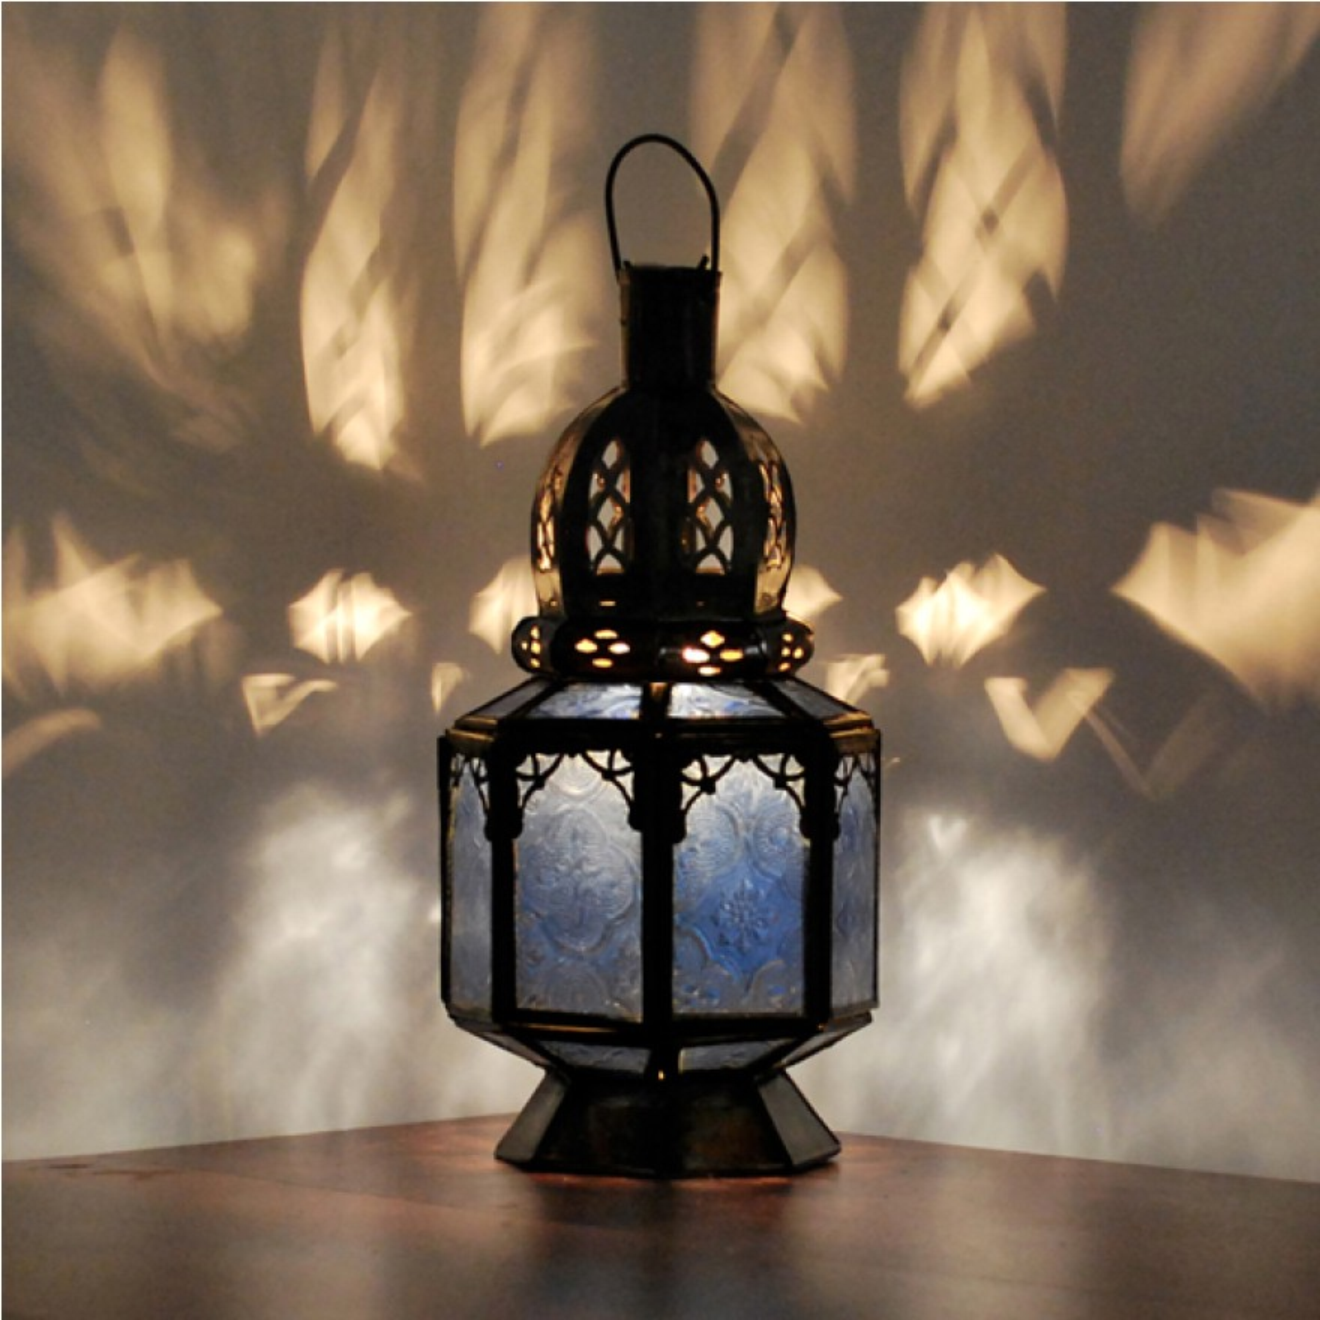 grosse auswahl an lampen aus marokko. Black Bedroom Furniture Sets. Home Design Ideas